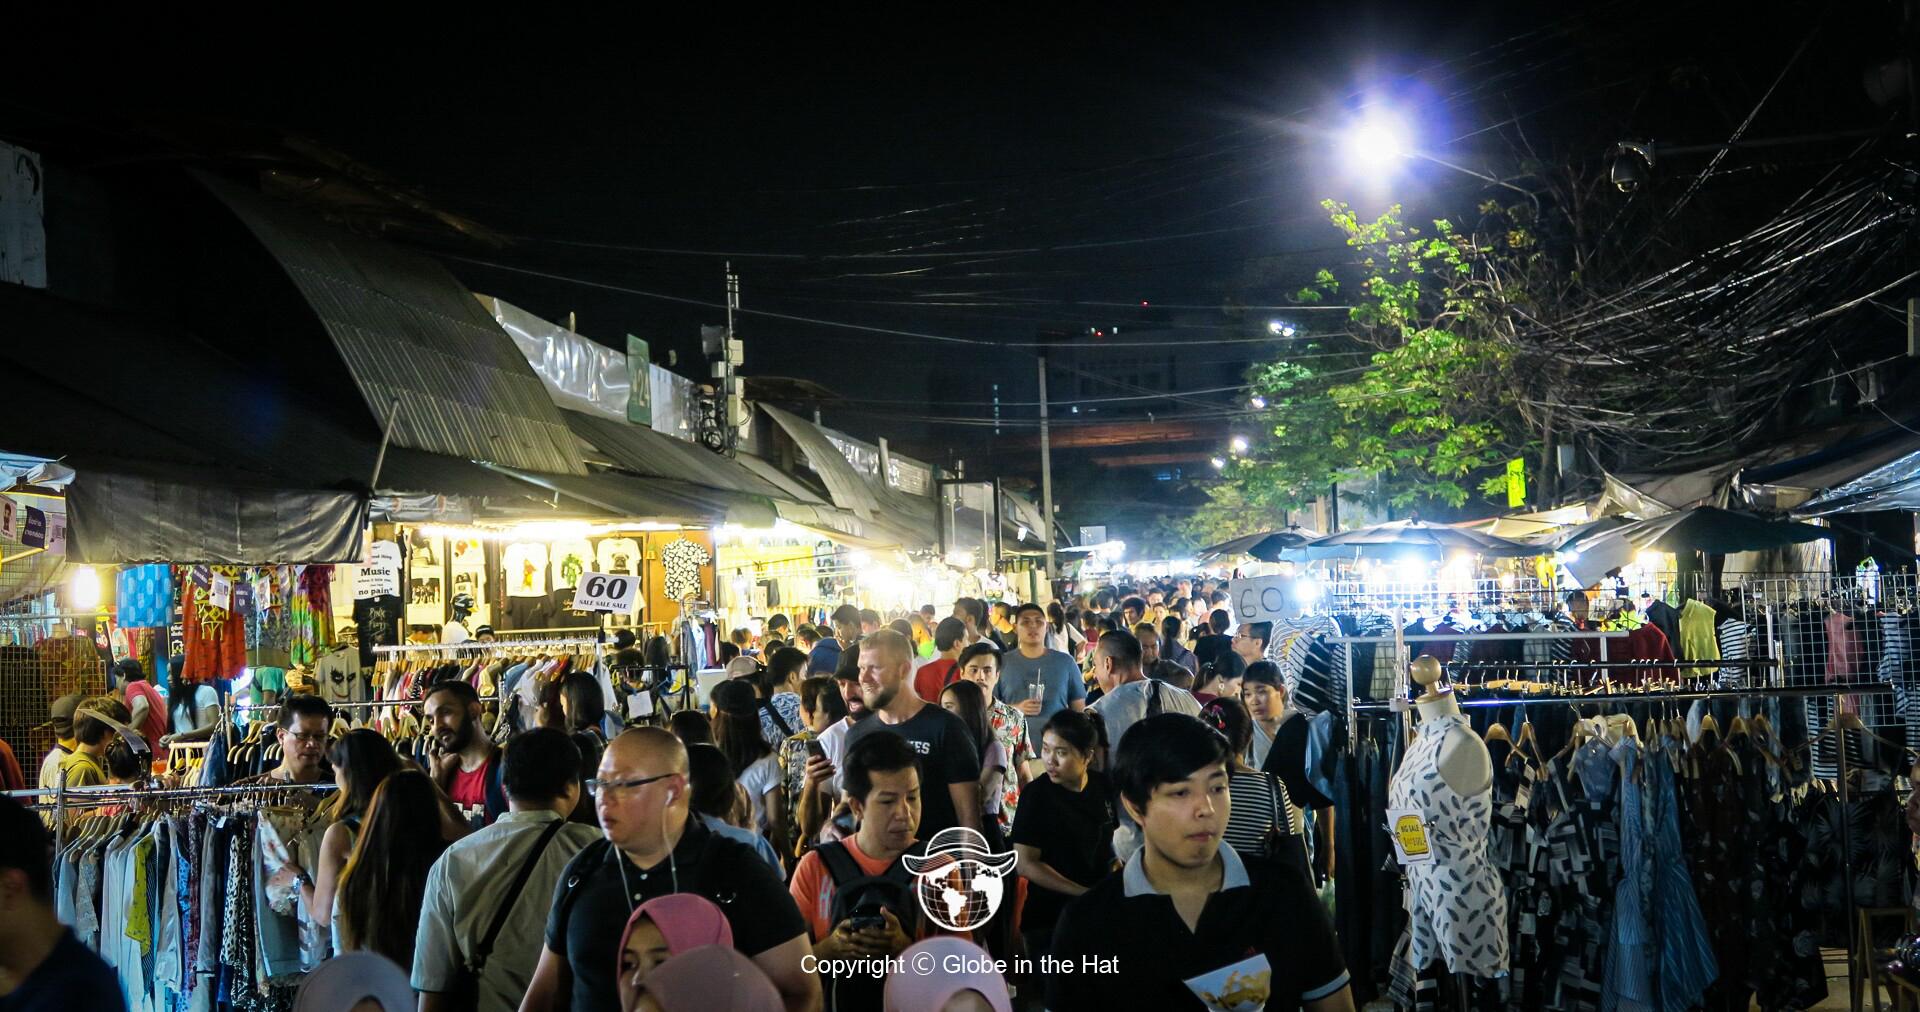 Chatuchak Market Bangkok Thailand - Globe in the Hat